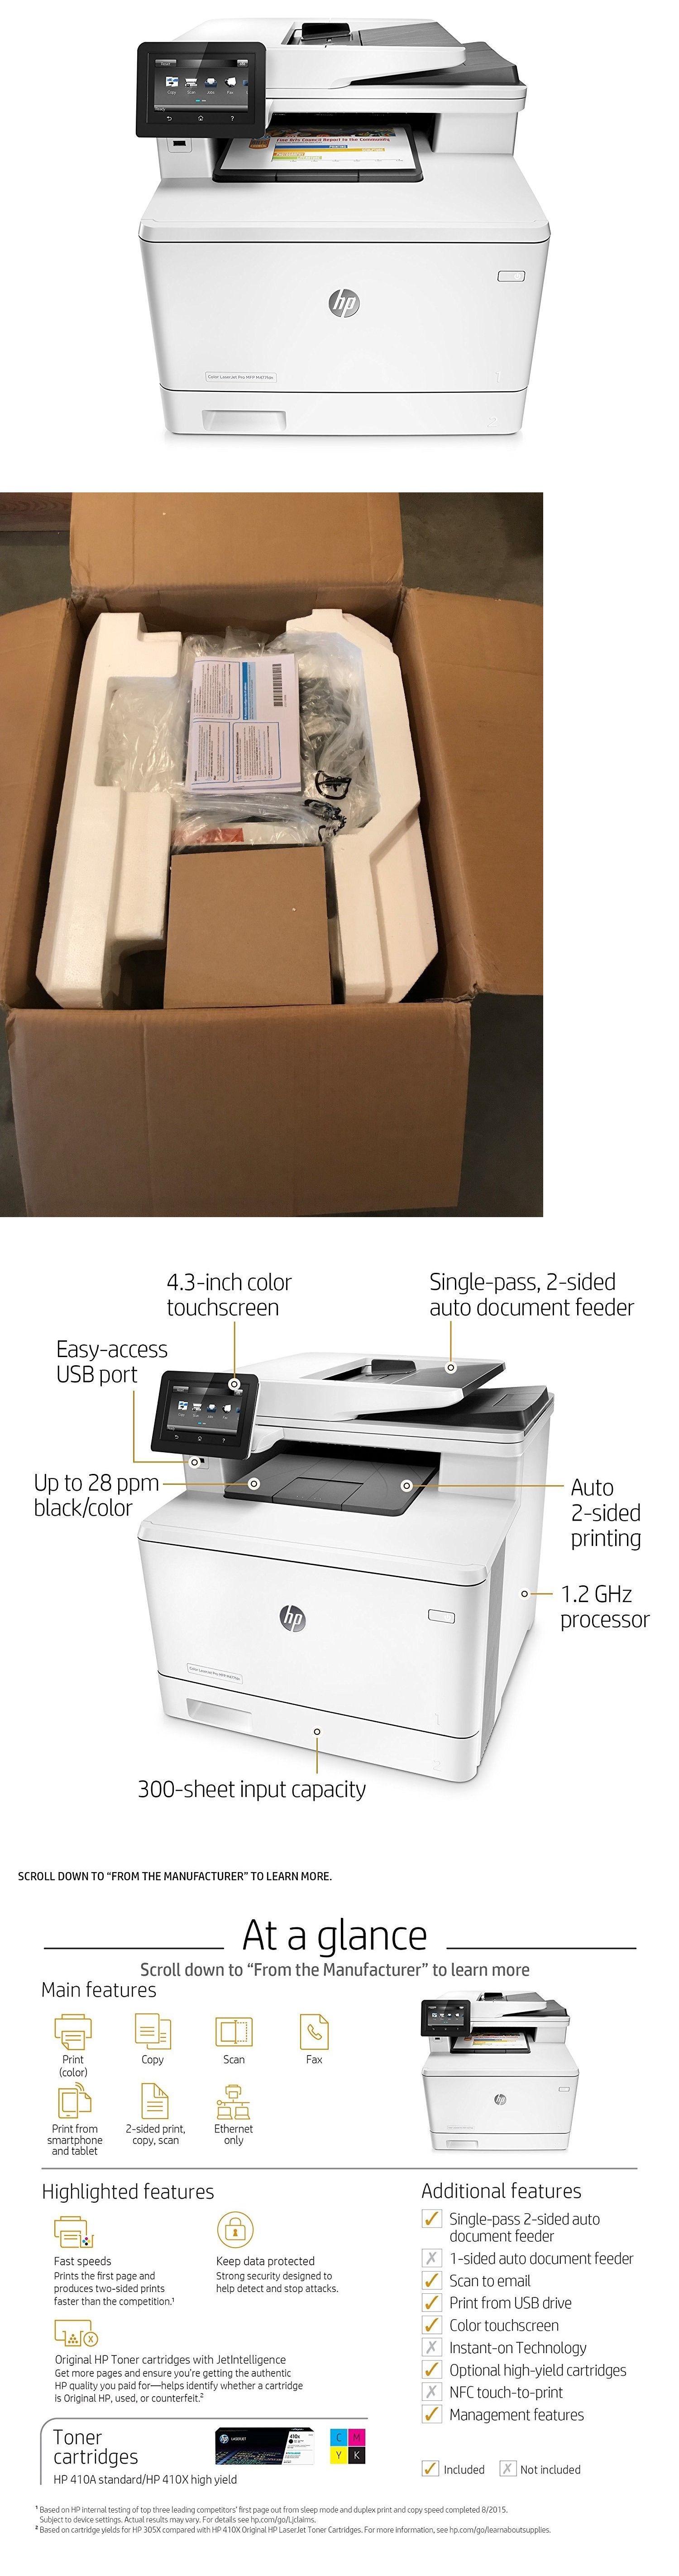 Pin On Printers 1245